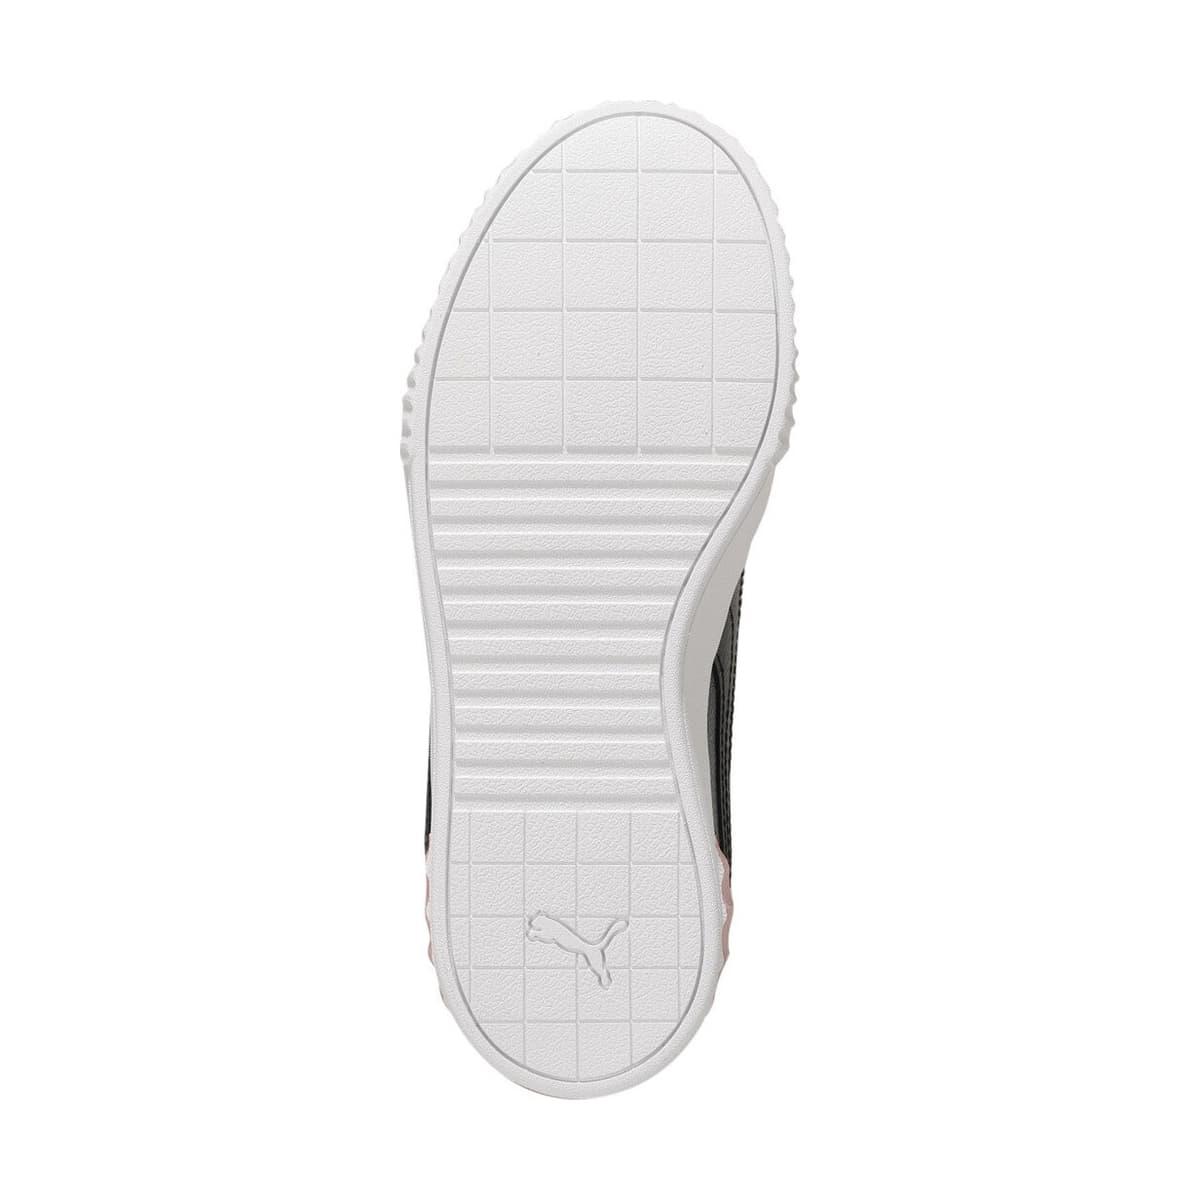 Carina Lift Kadın Siyah Spor Ayakkabı (373031-05)